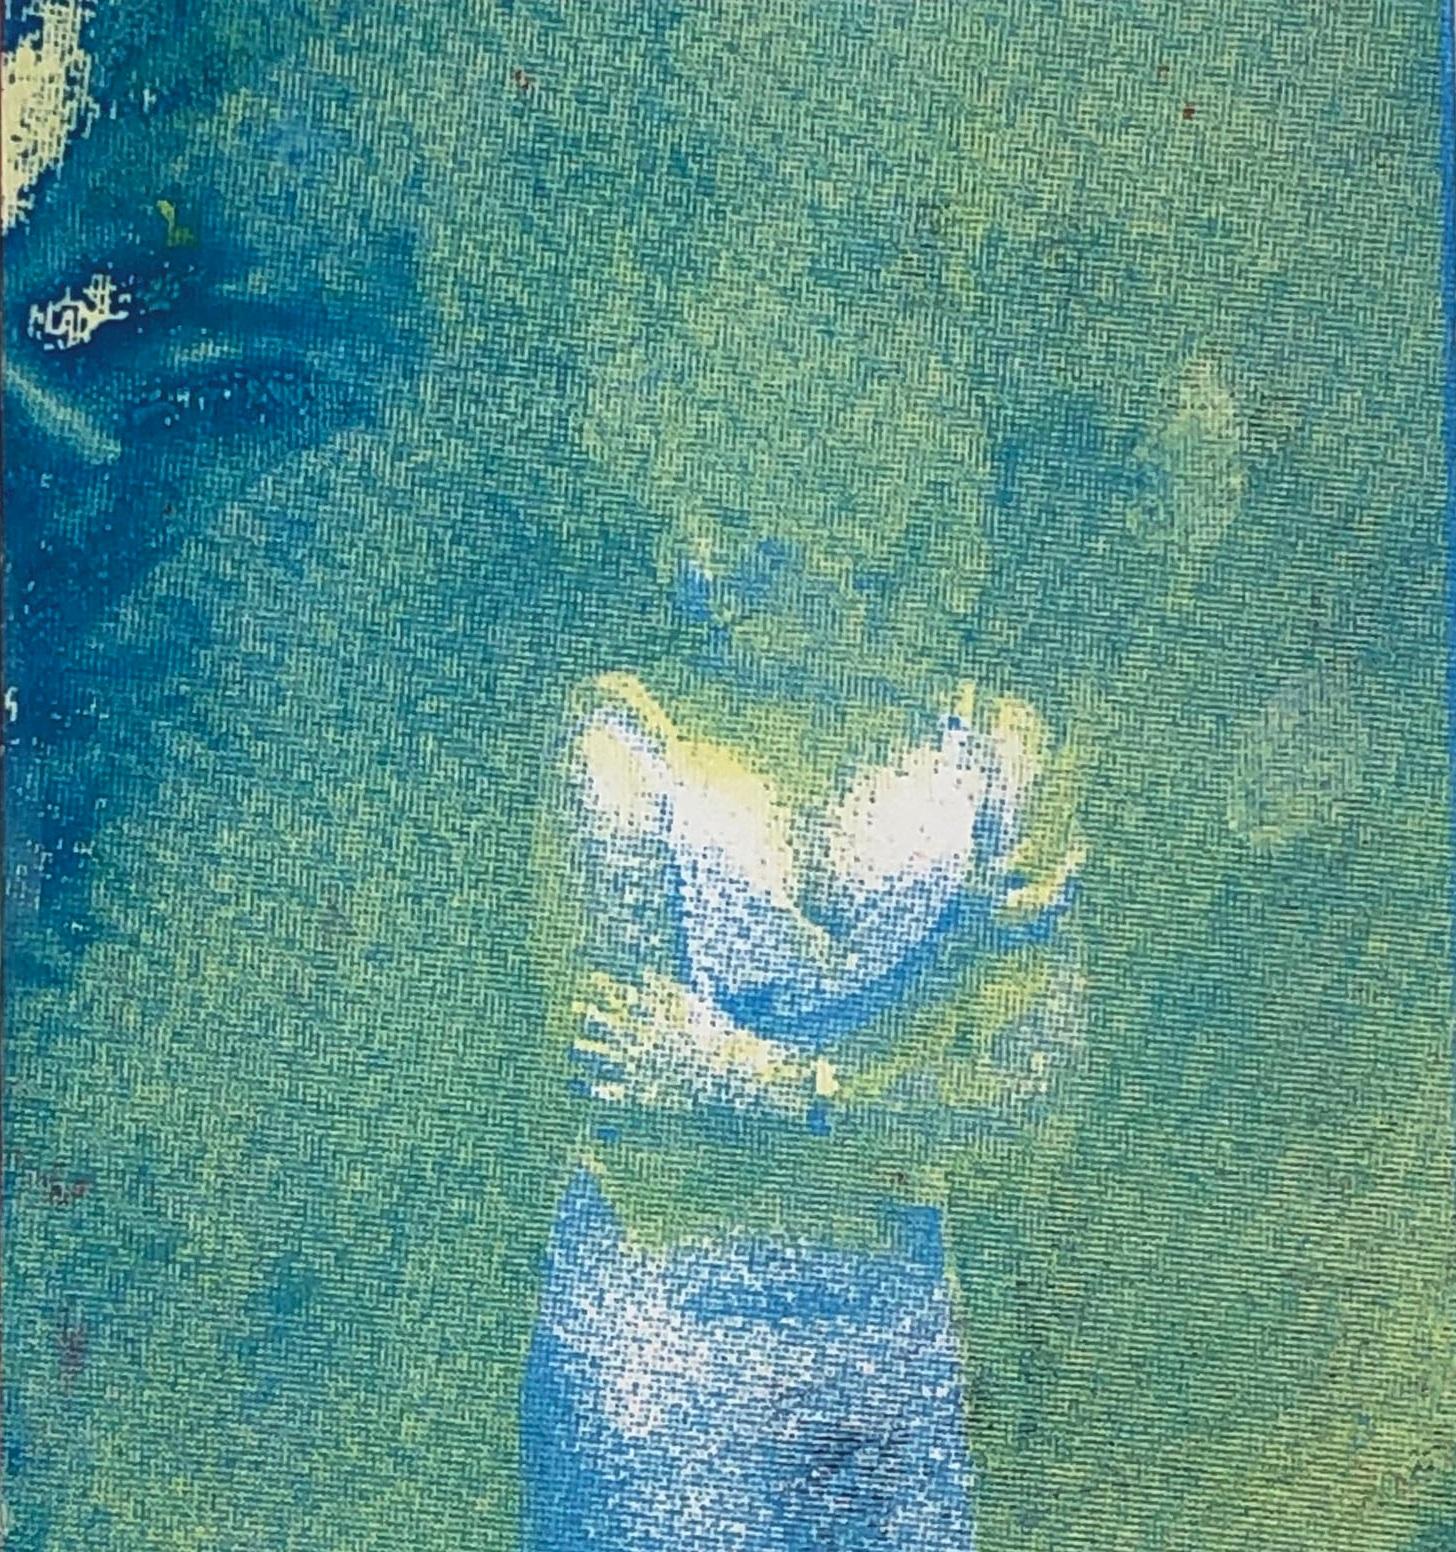 Diana Vasquez Becerra, Goosebumps, Screenprint on Paper, 5 x 4.5 in., $20 (1).jpg